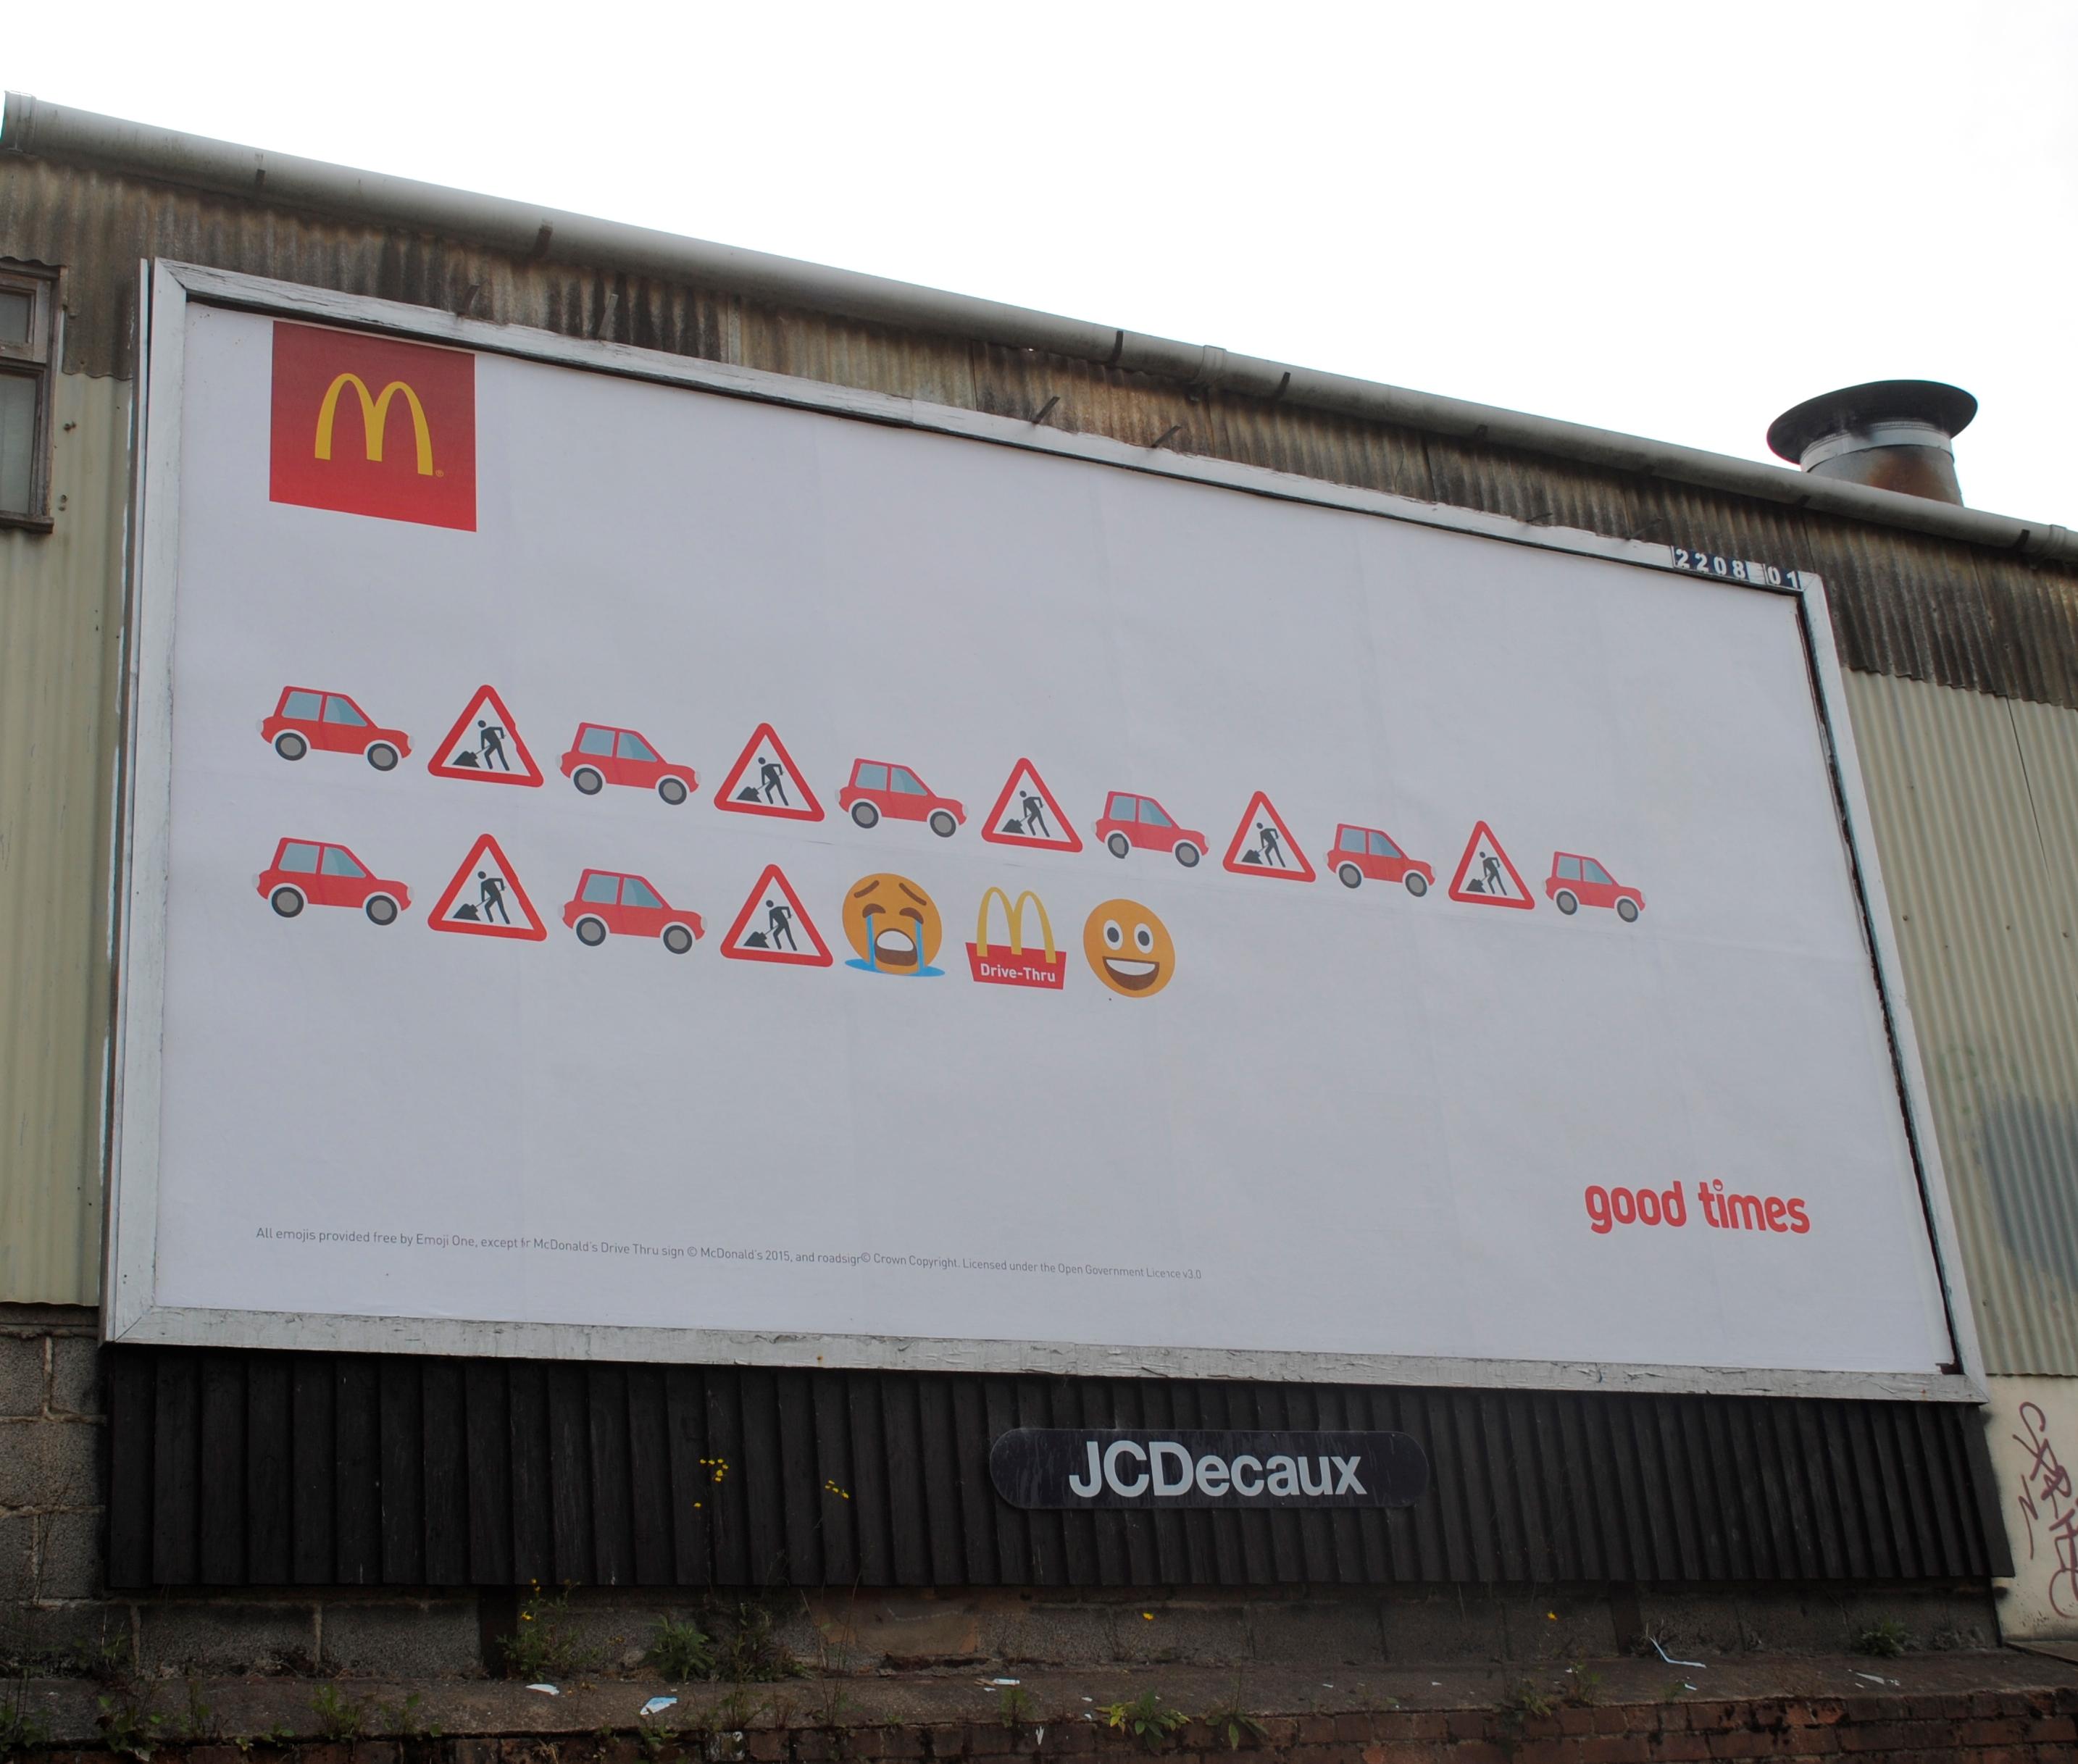 Fury As Giant McDonald's Drive-Thru Adverts Go Up Around